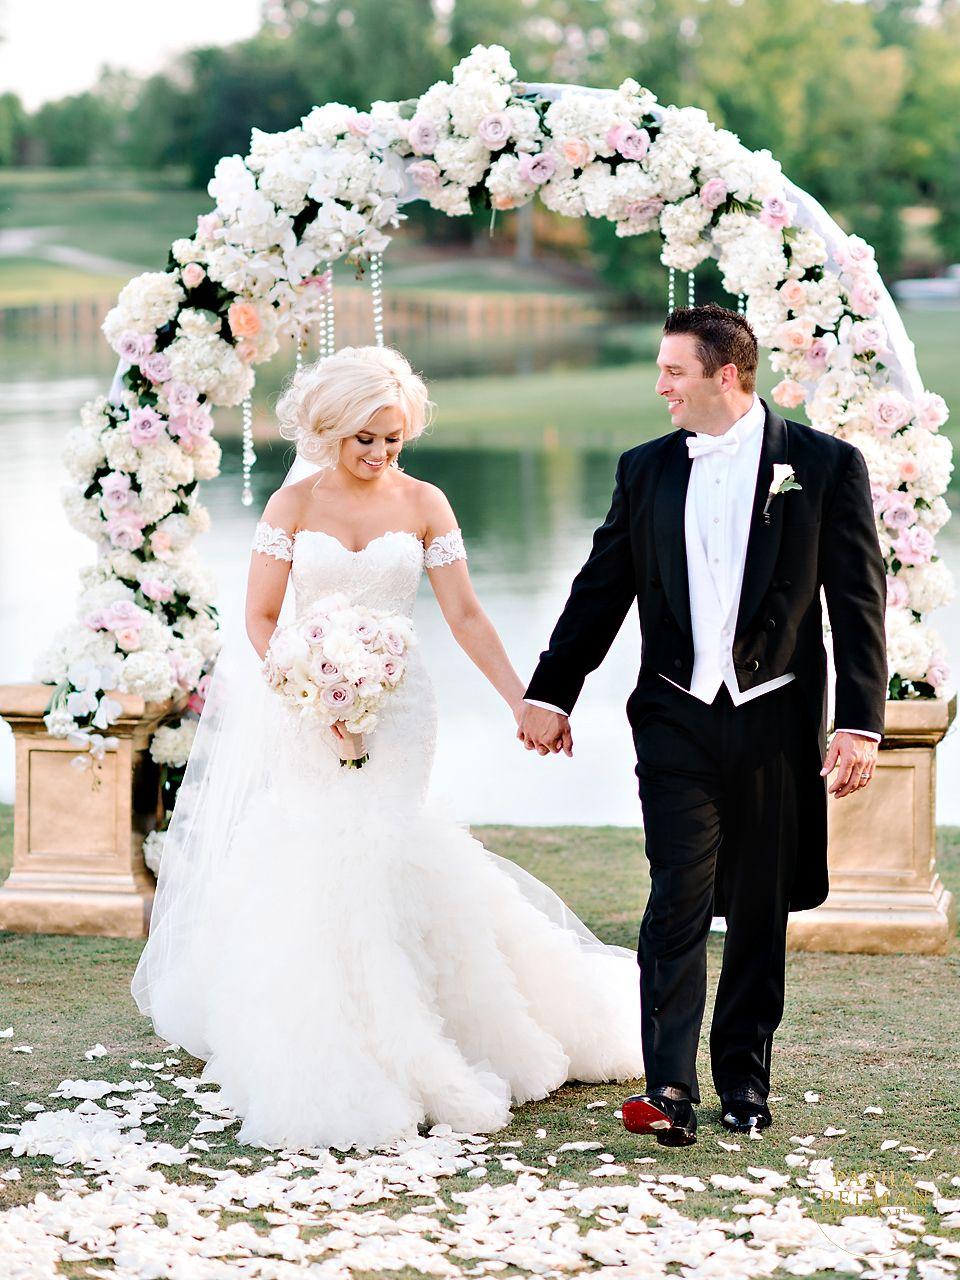 Whitney + Shawn North carolina wedding, Wedding